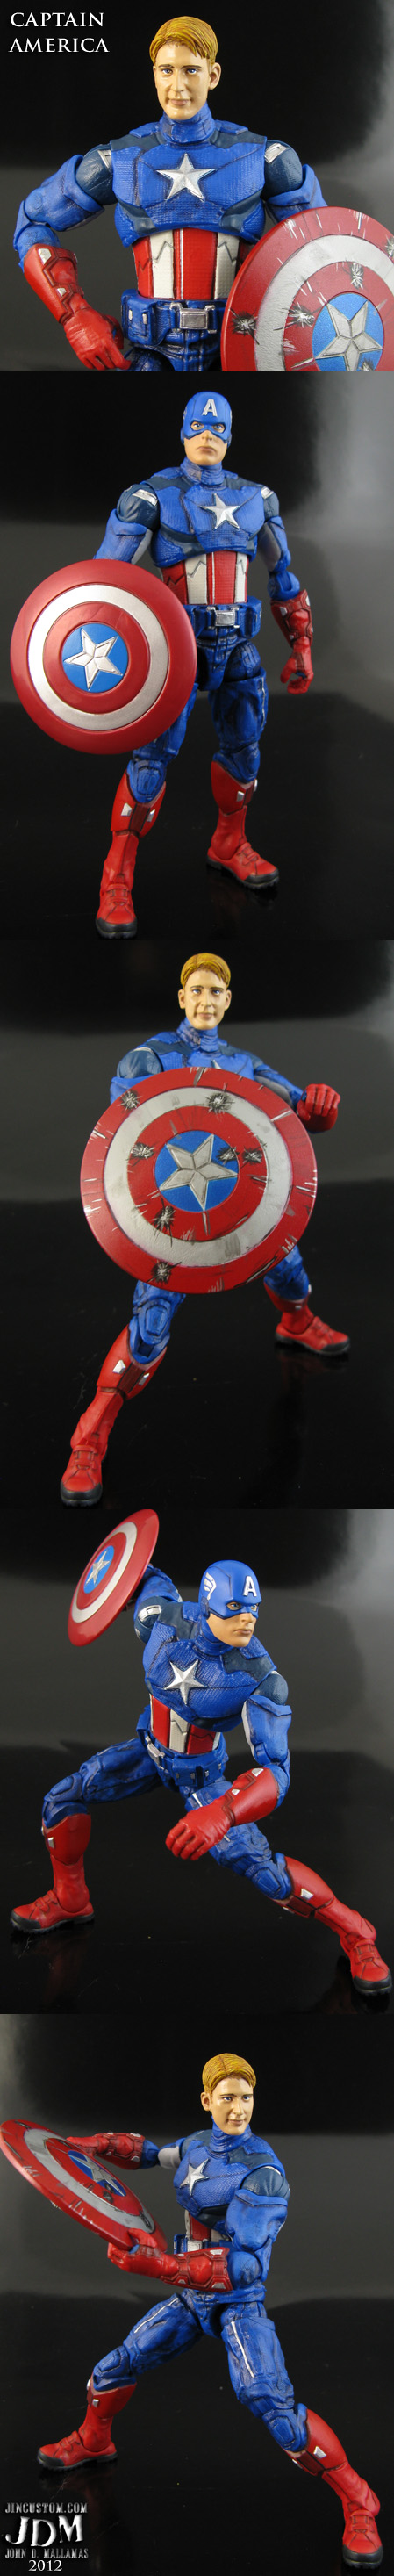 Custom Captain America Avengers movie figure by Jin-Saotome